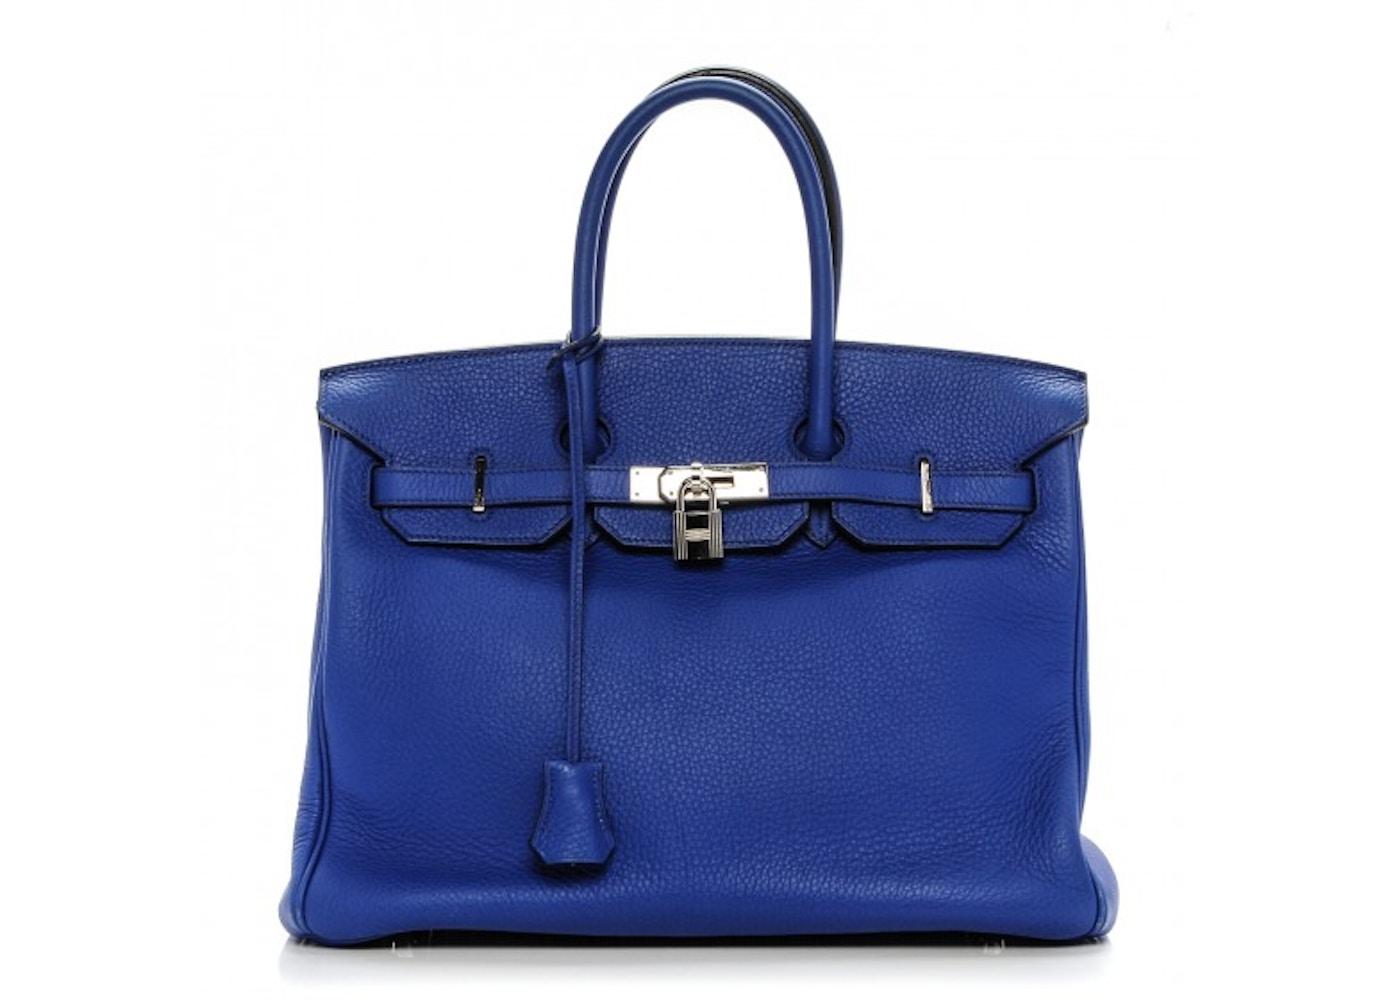 b4a622489d89 Buy   Sell Hermes Birkin Handbags - New Highest Bids